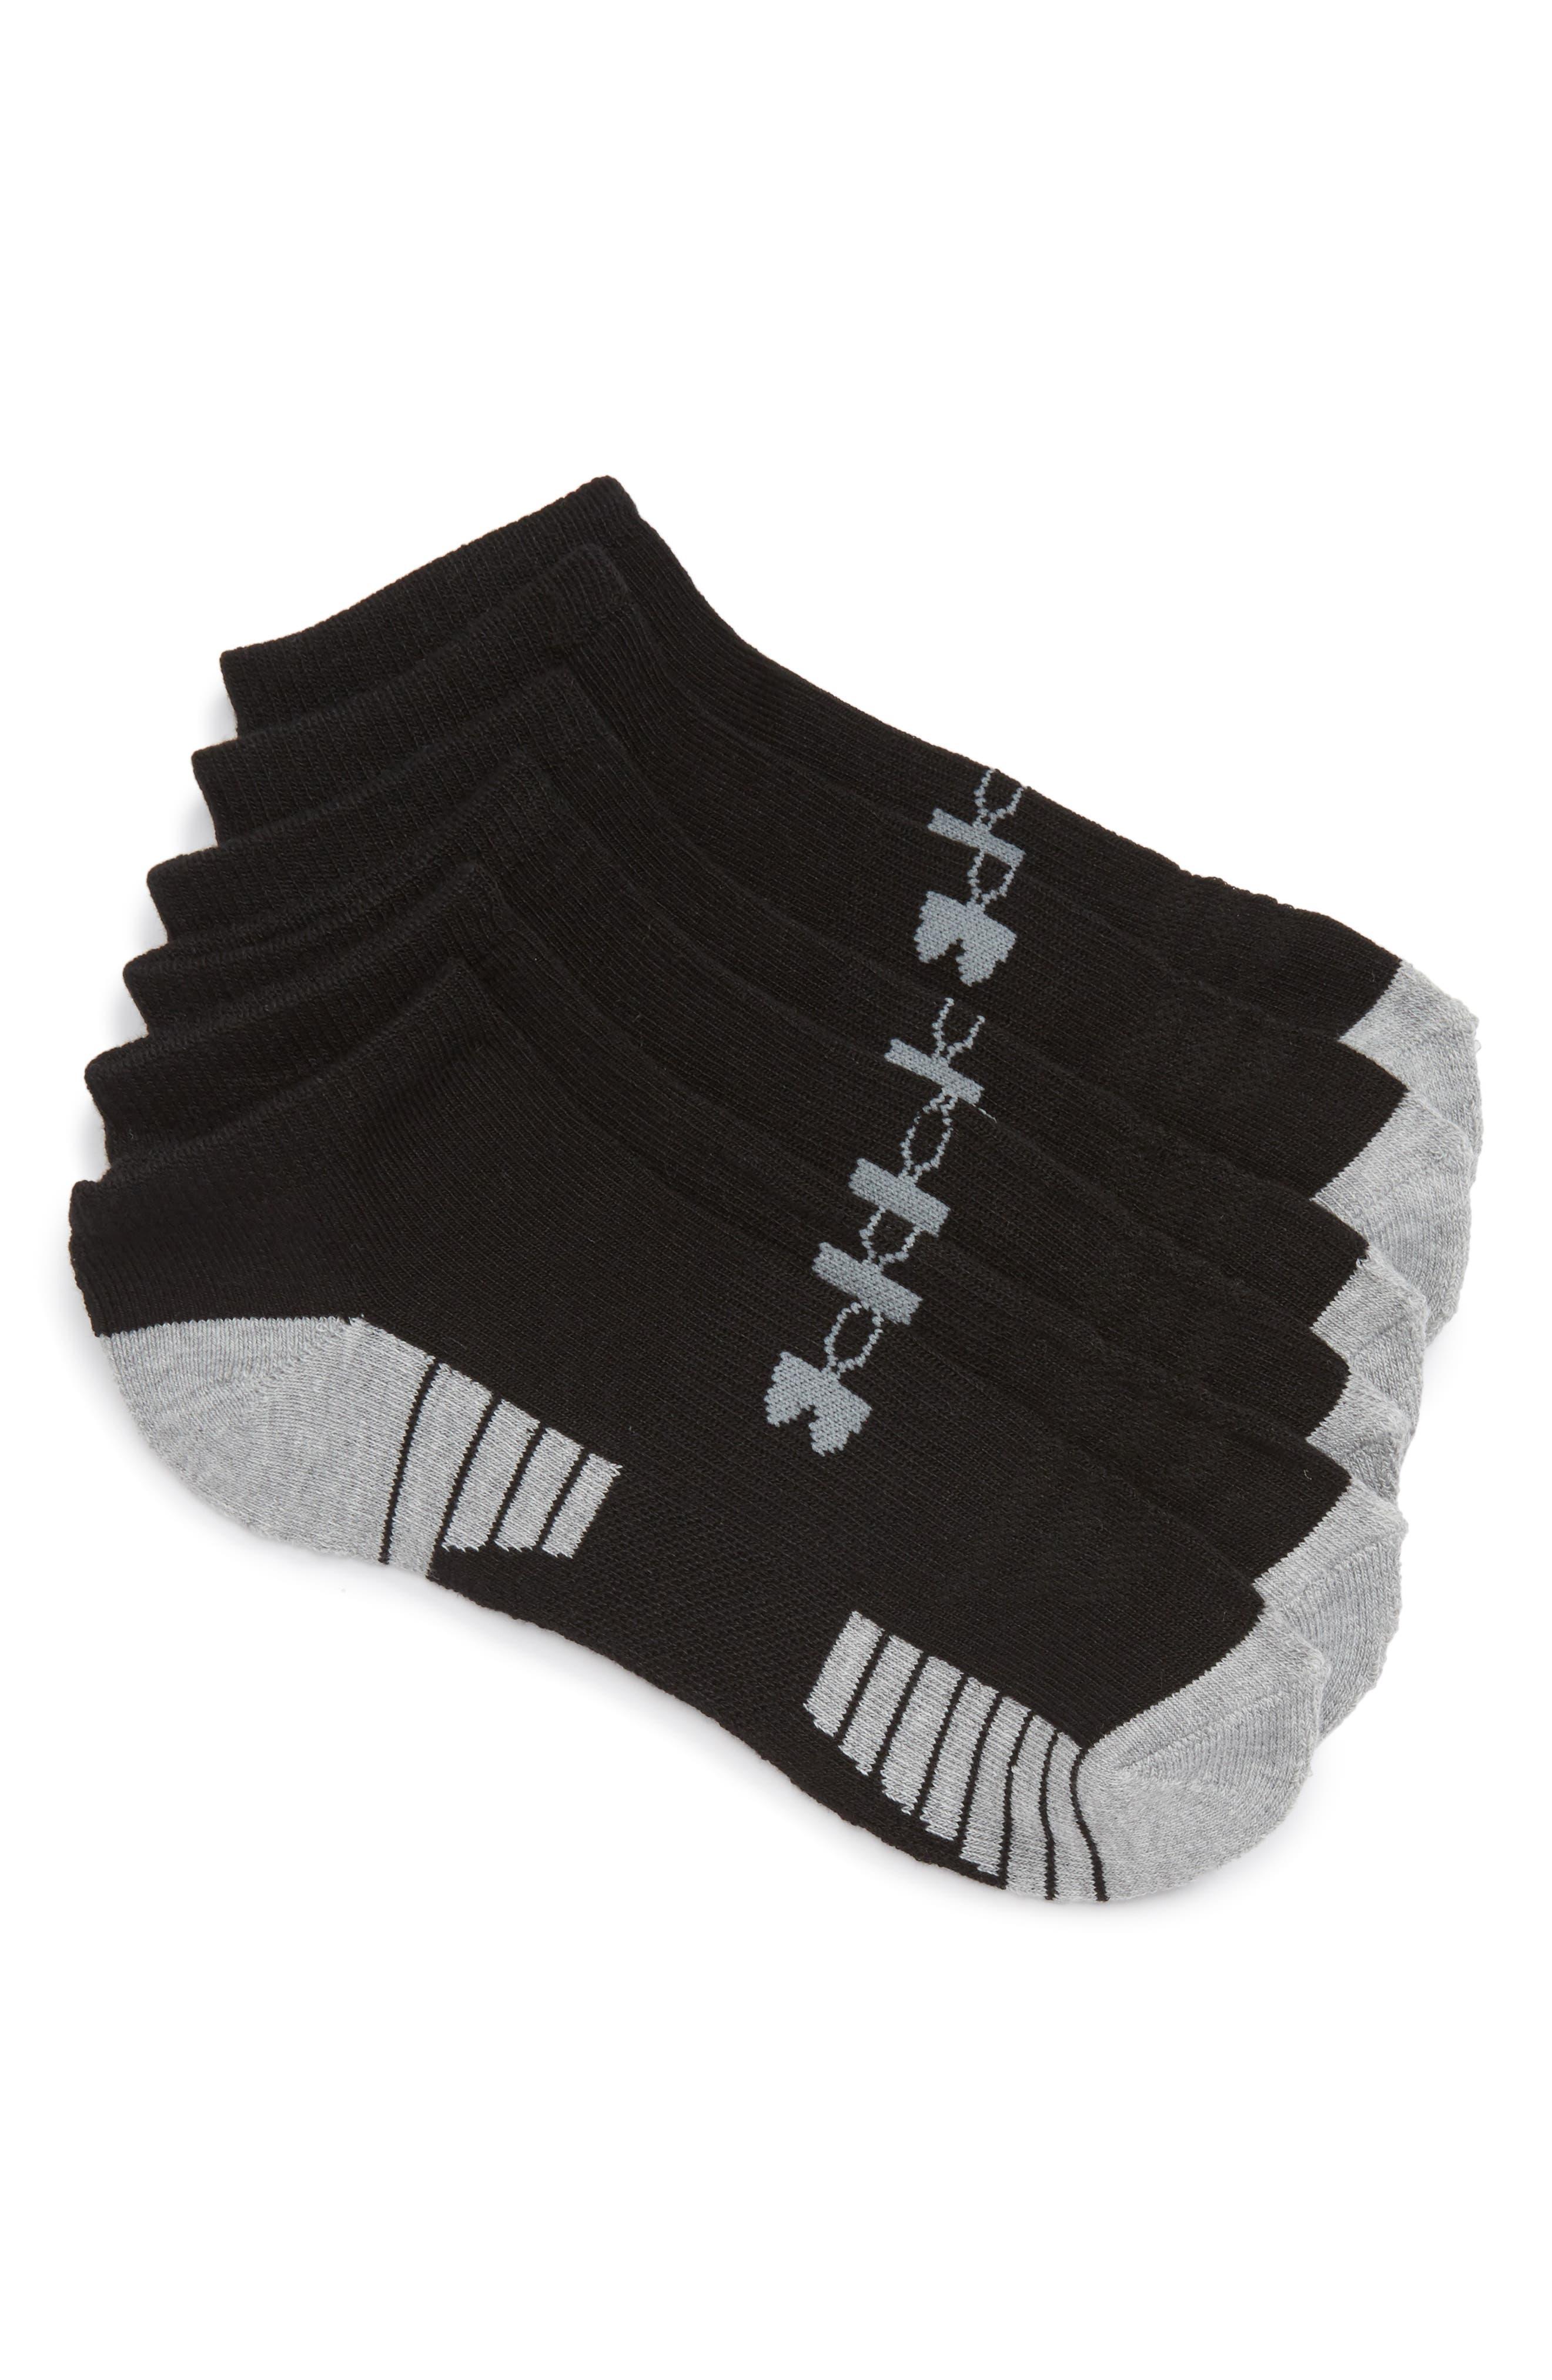 HeatGear 3-Pack No-Show Socks,                             Main thumbnail 1, color,                             001